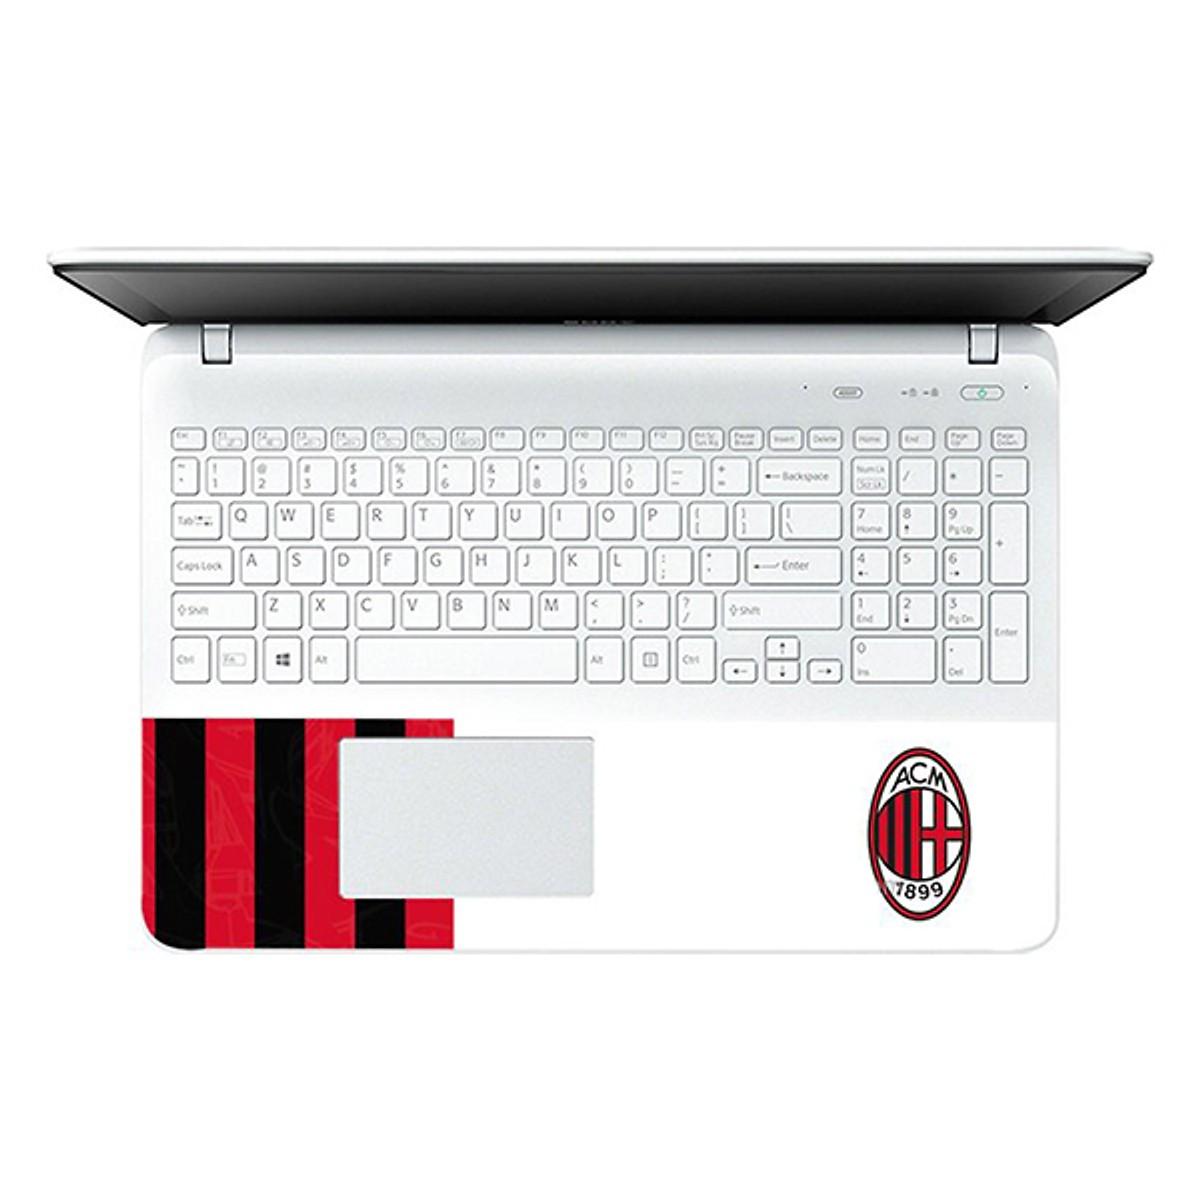 Mẫu Dán Laptop Logo LTLG-41 cỡ 13 inch